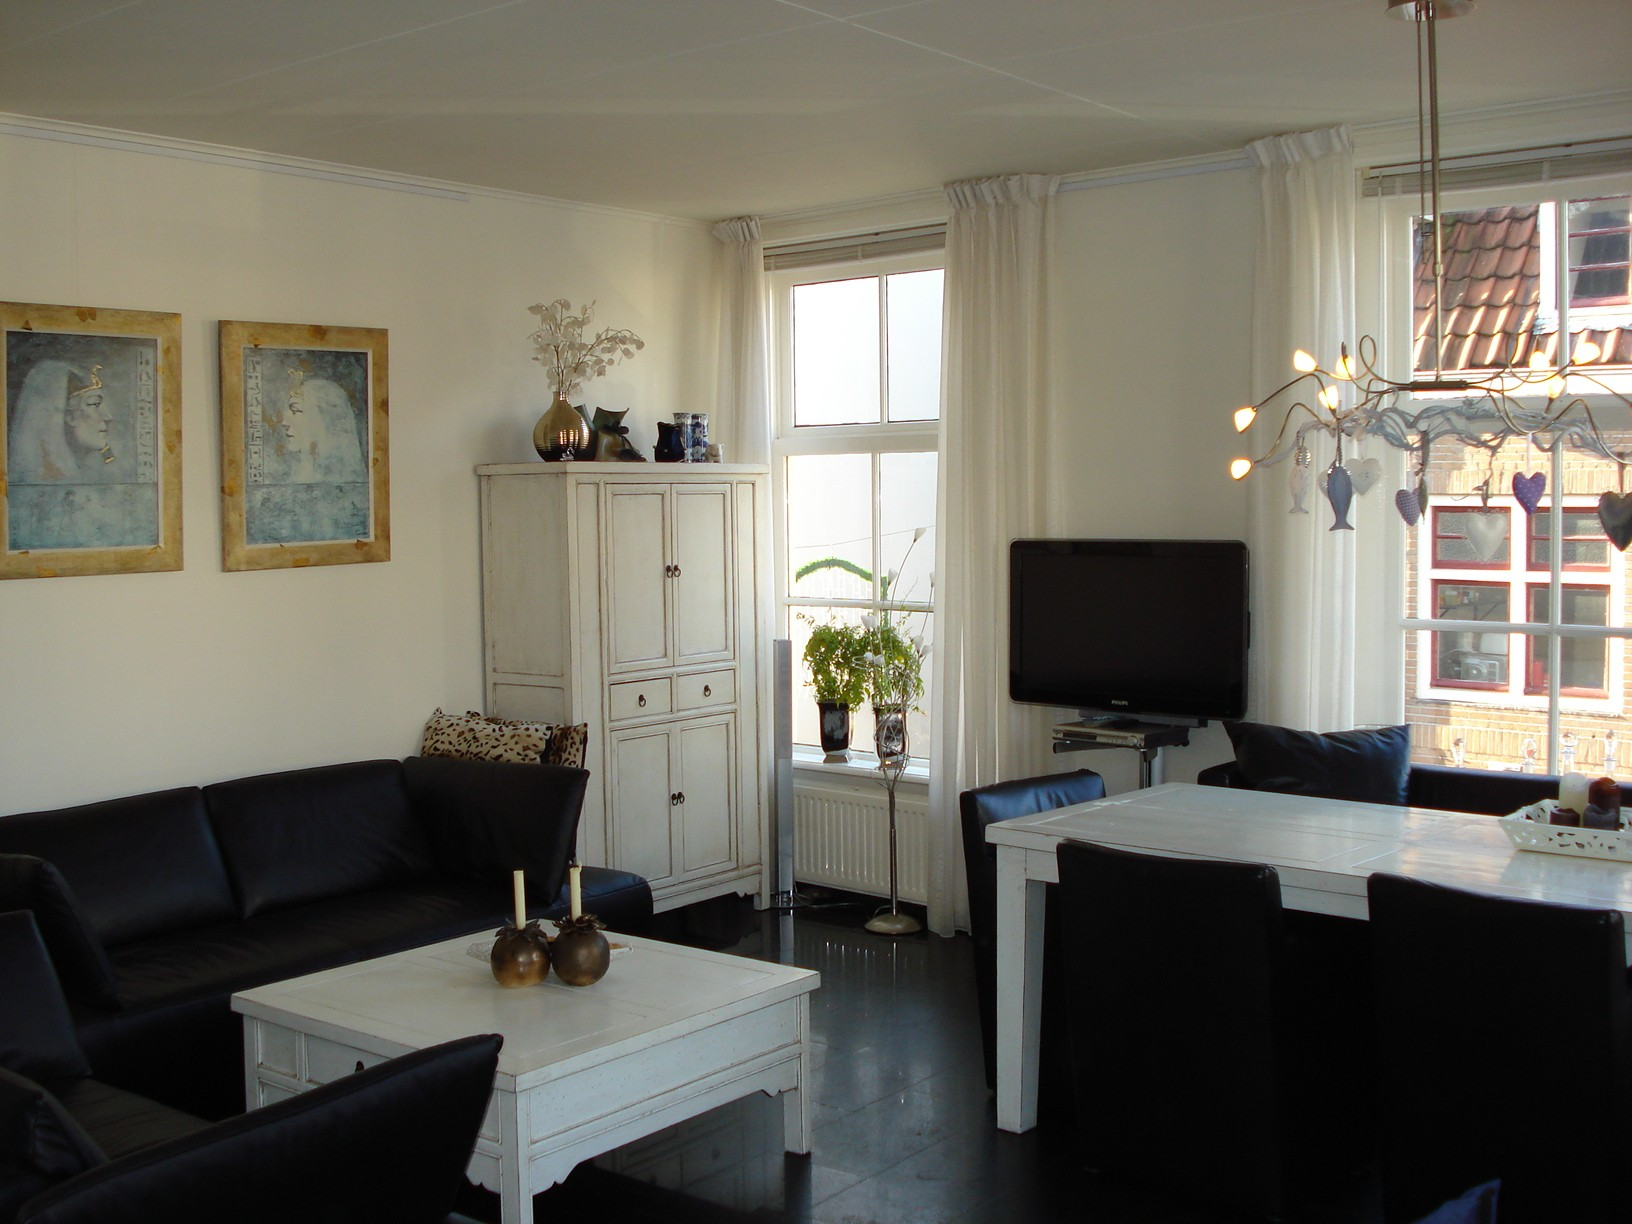 Kamer te huur in de Buitenkant in Zwolle